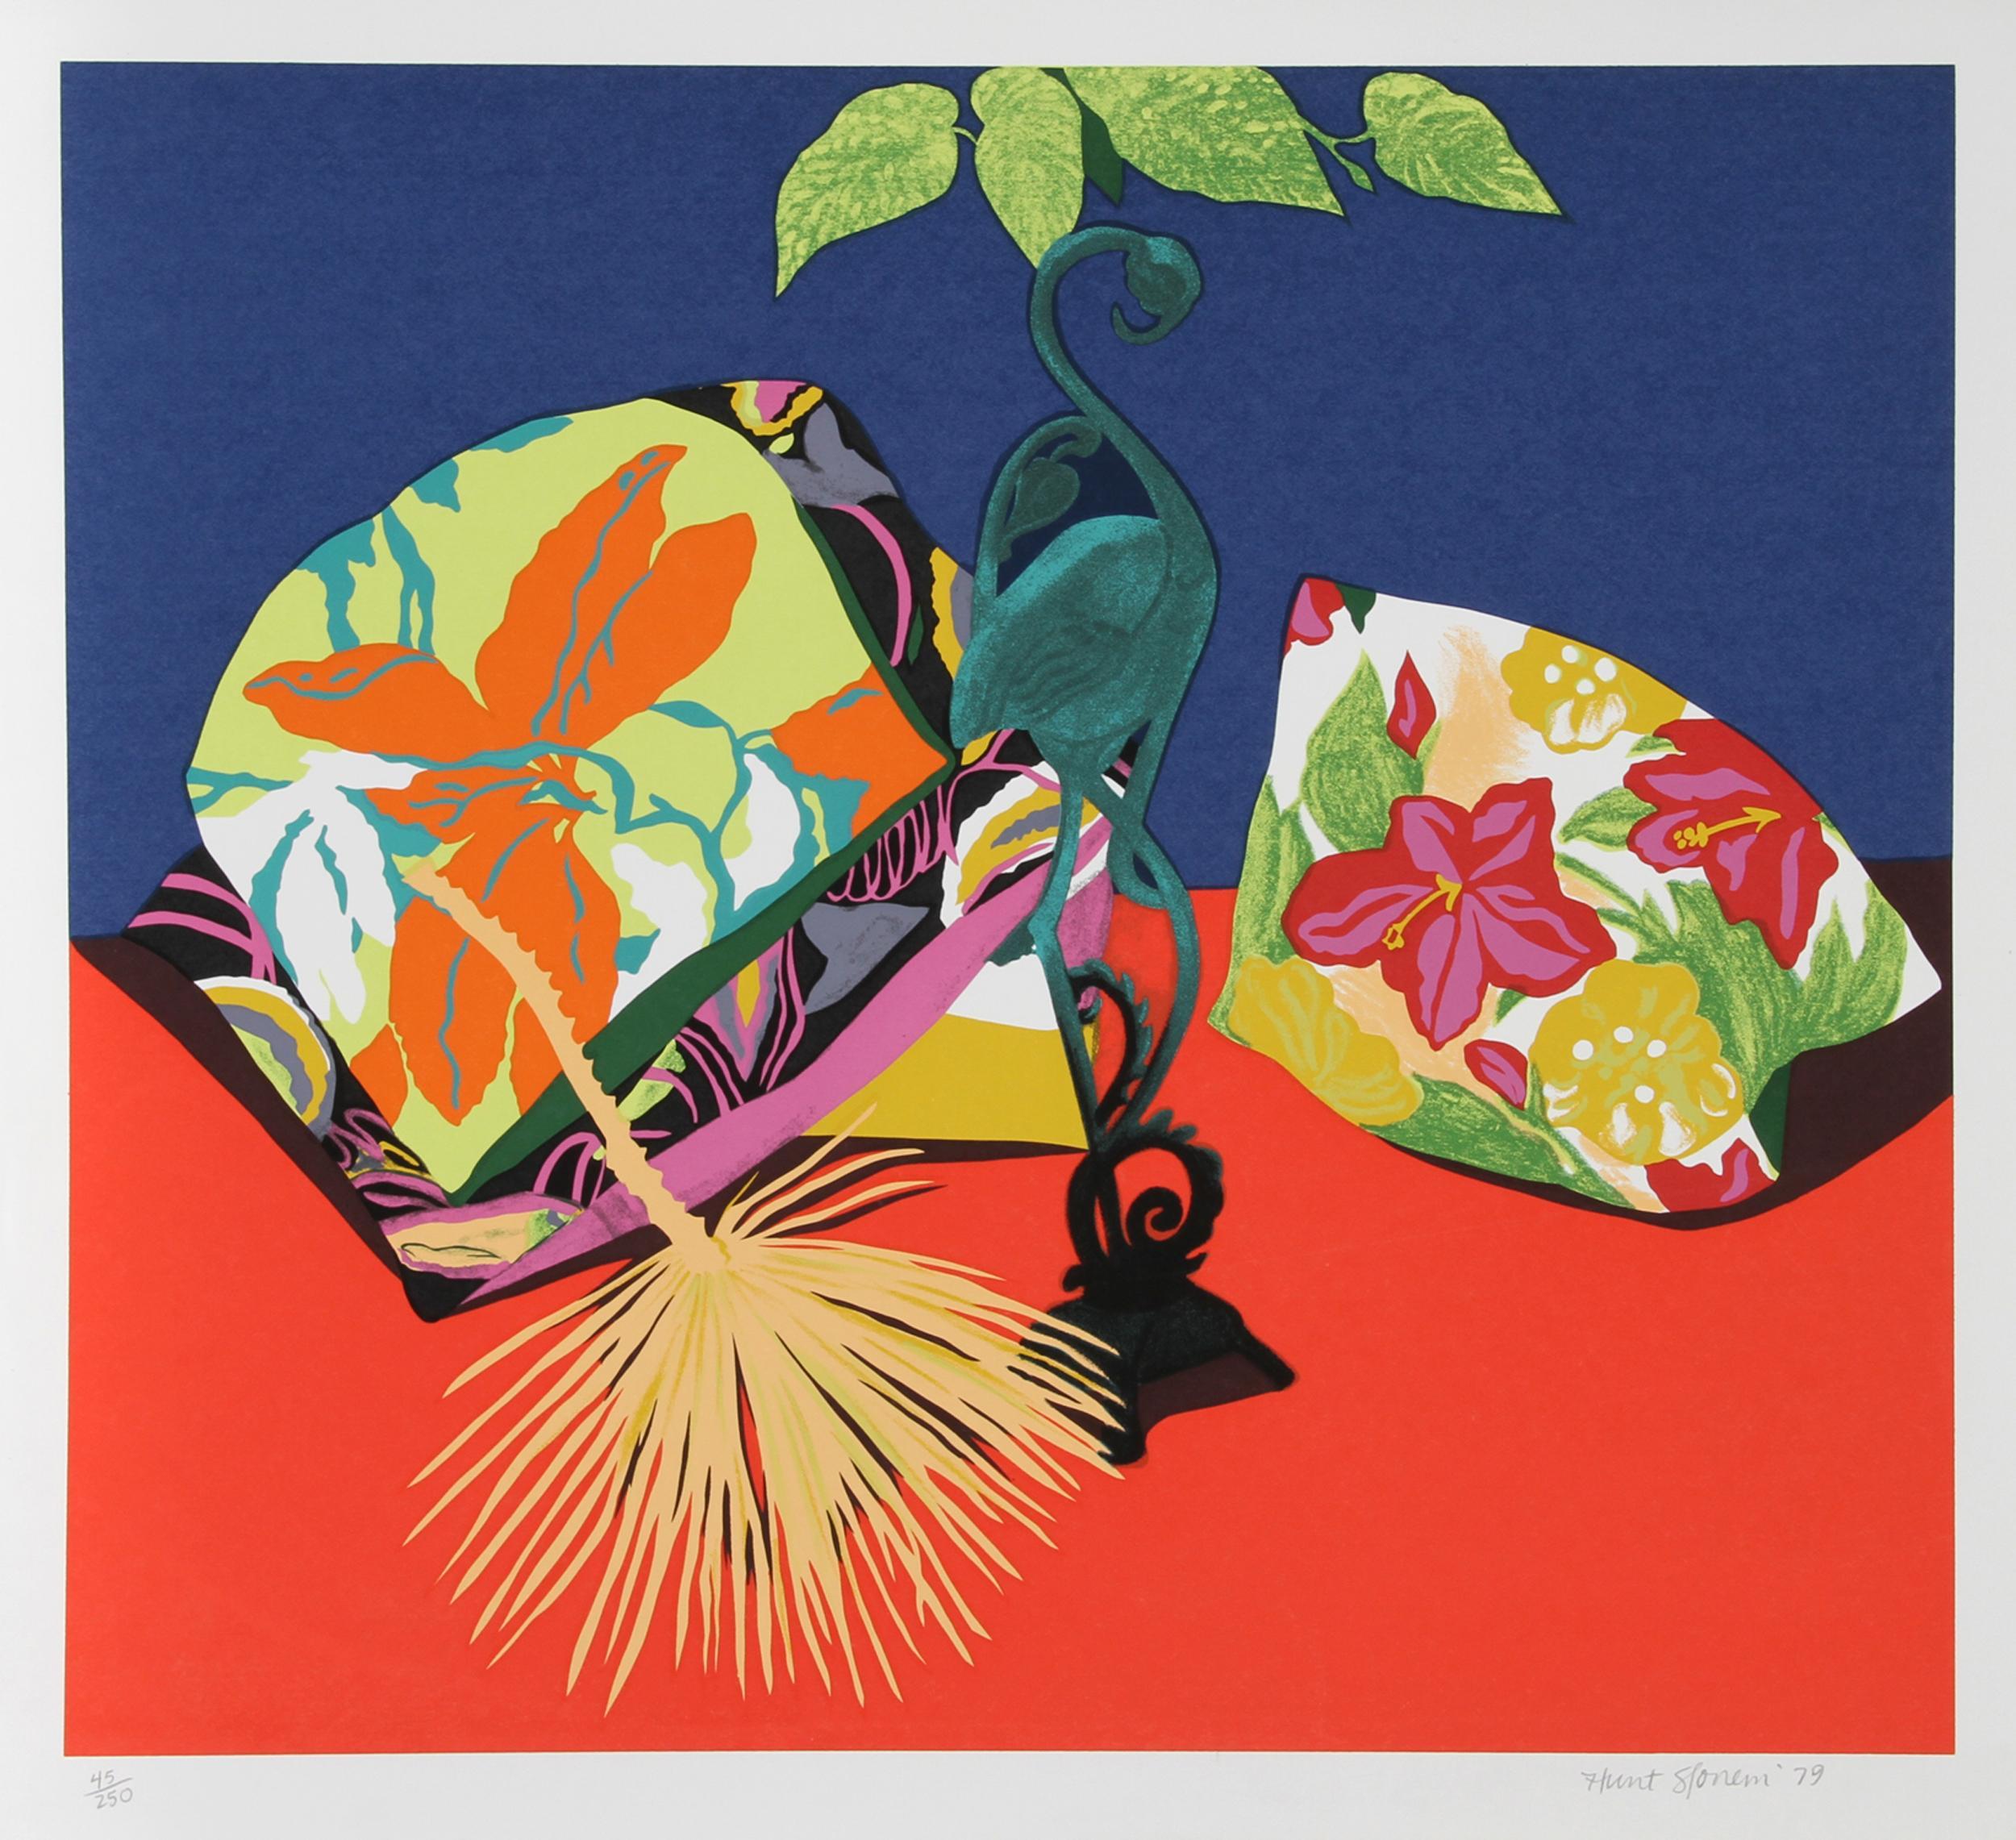 Hunt Slonem, Iron Flamingo, Serigraph